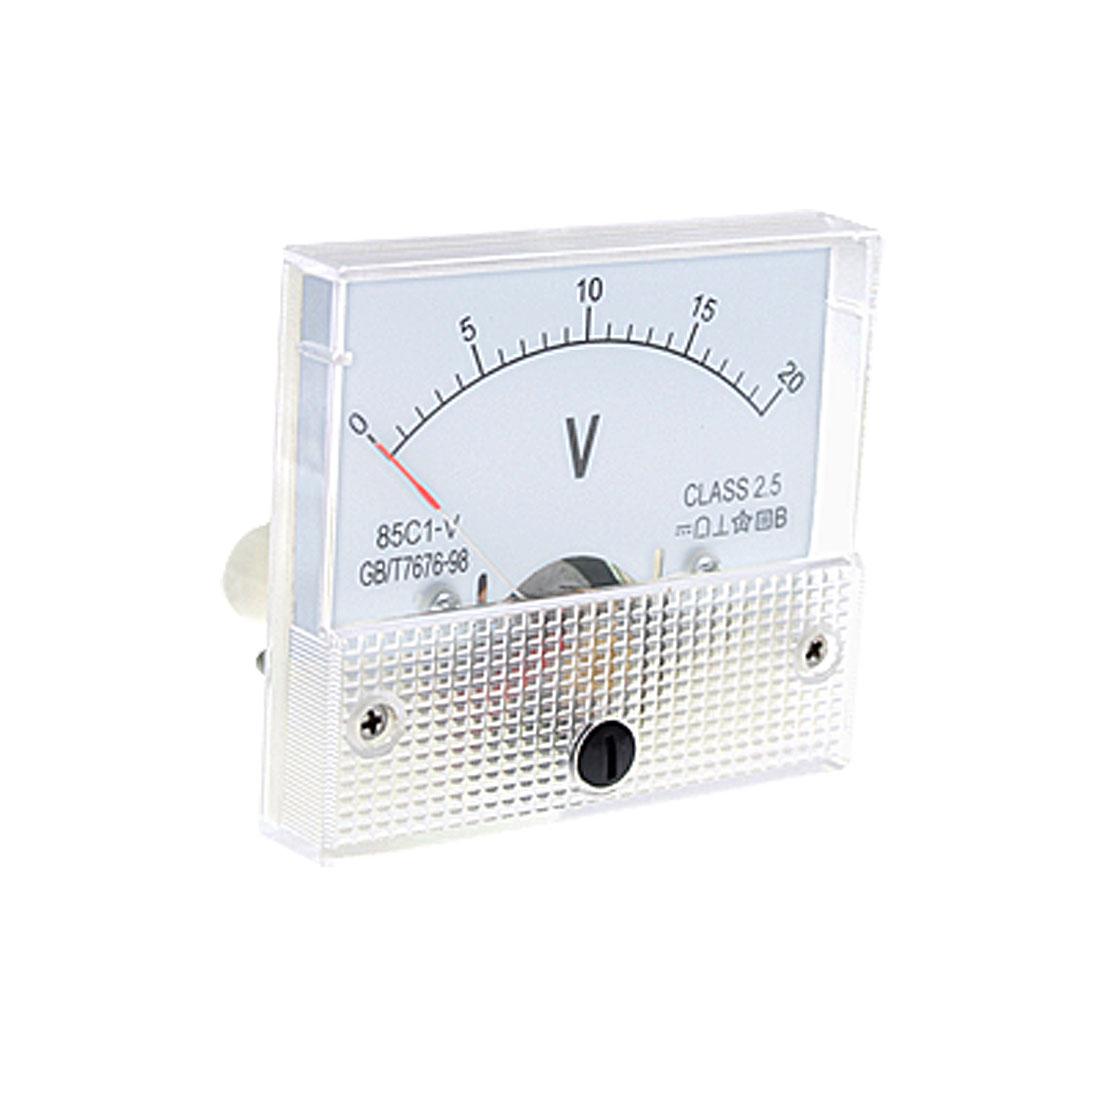 DC 0~20V 85C1-V Class 2.5 Voltmeter Analog Volt Panel Meter